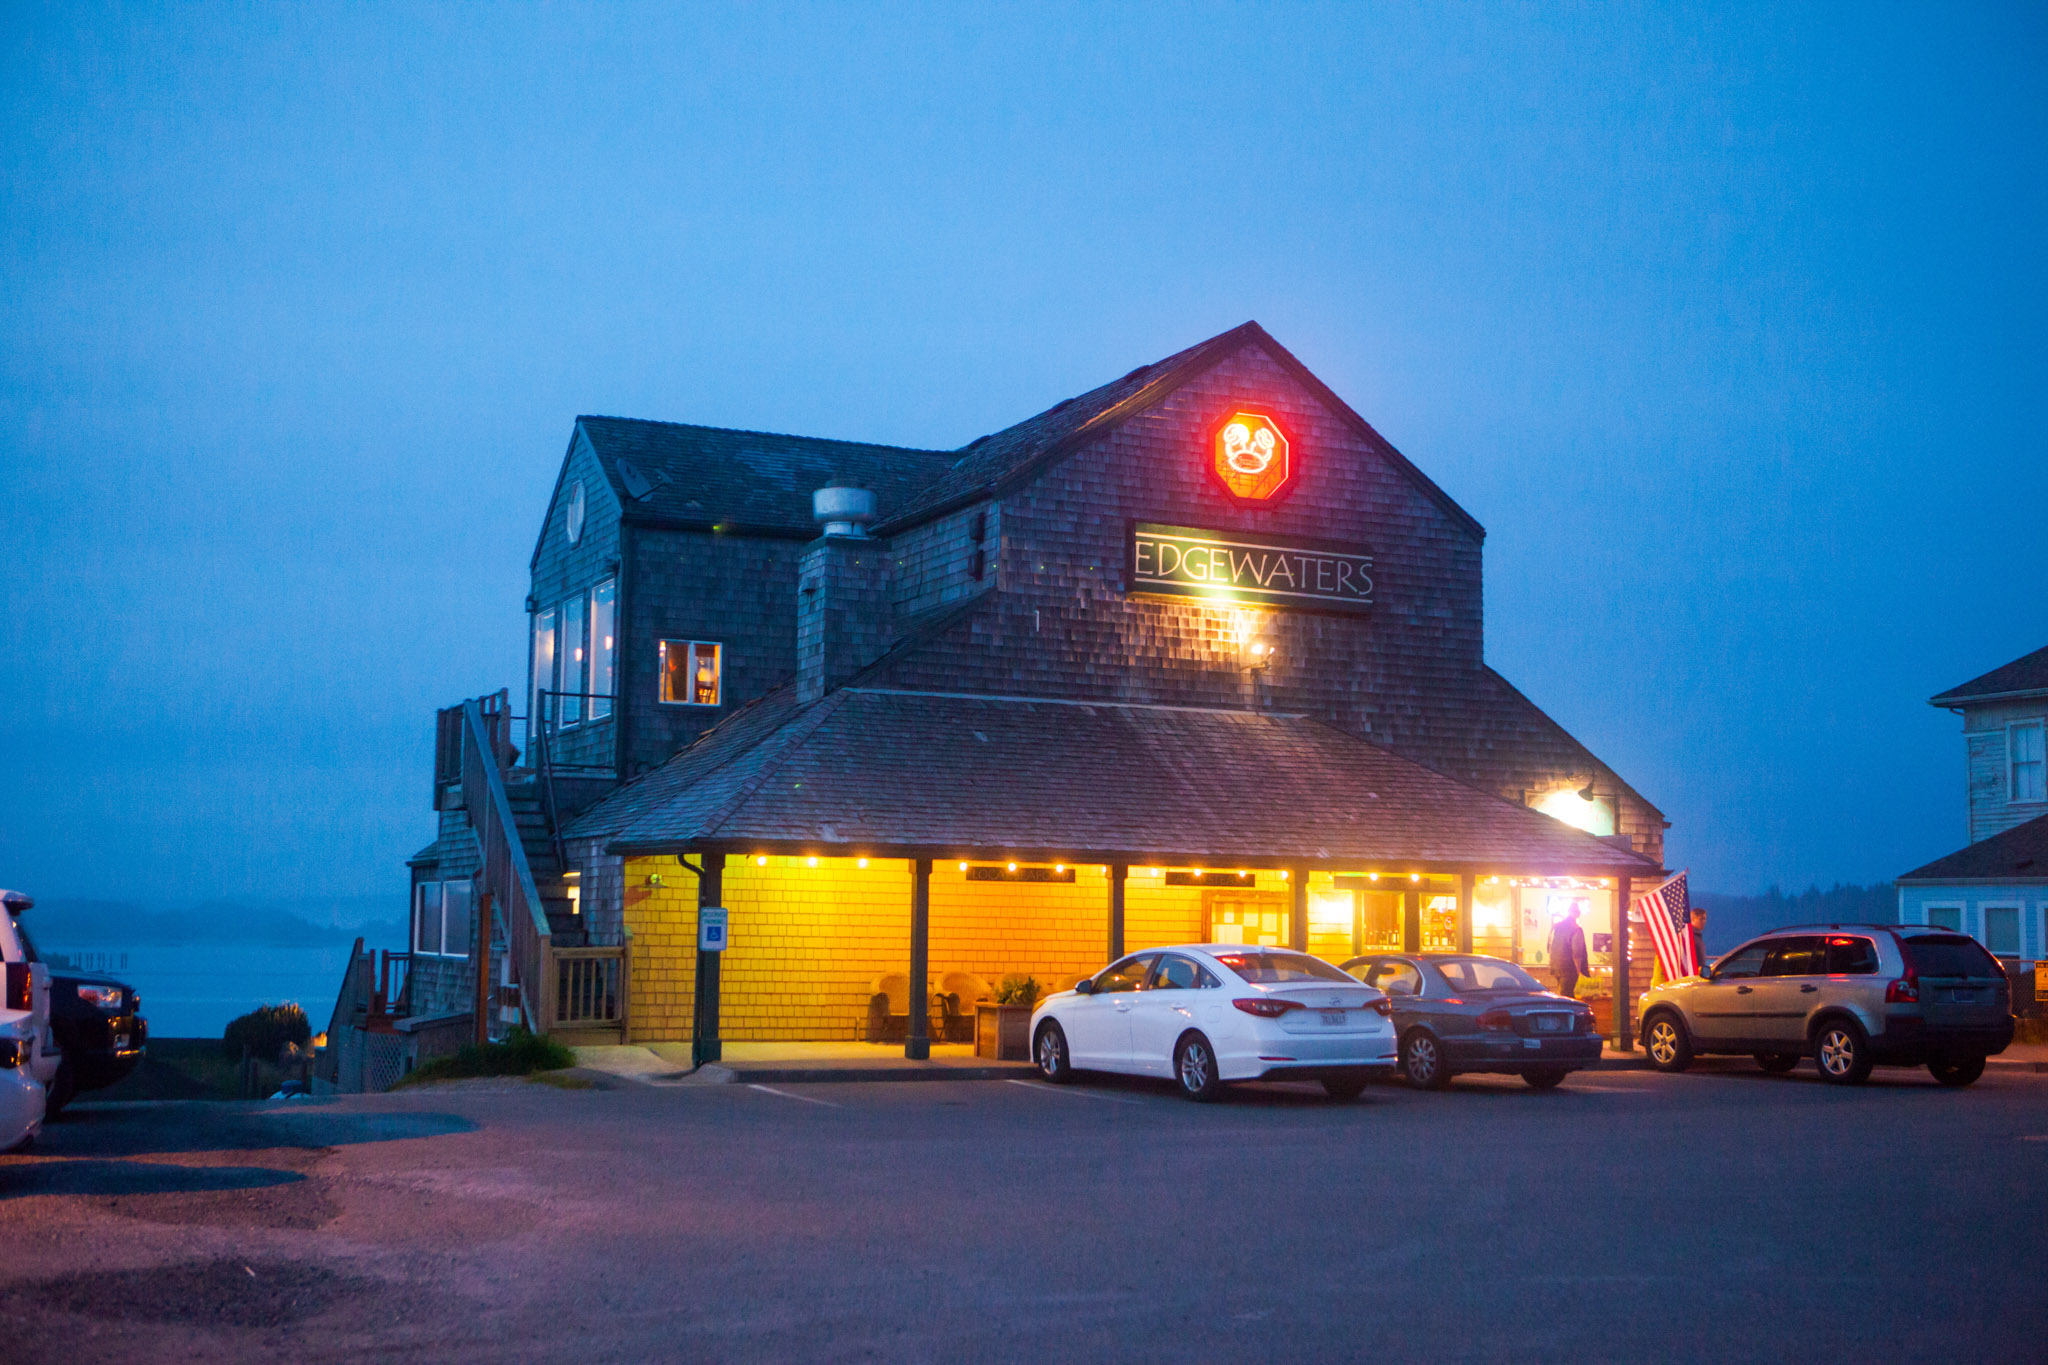 Edgewaters Restaurant  Best Western Inn at Face Rock